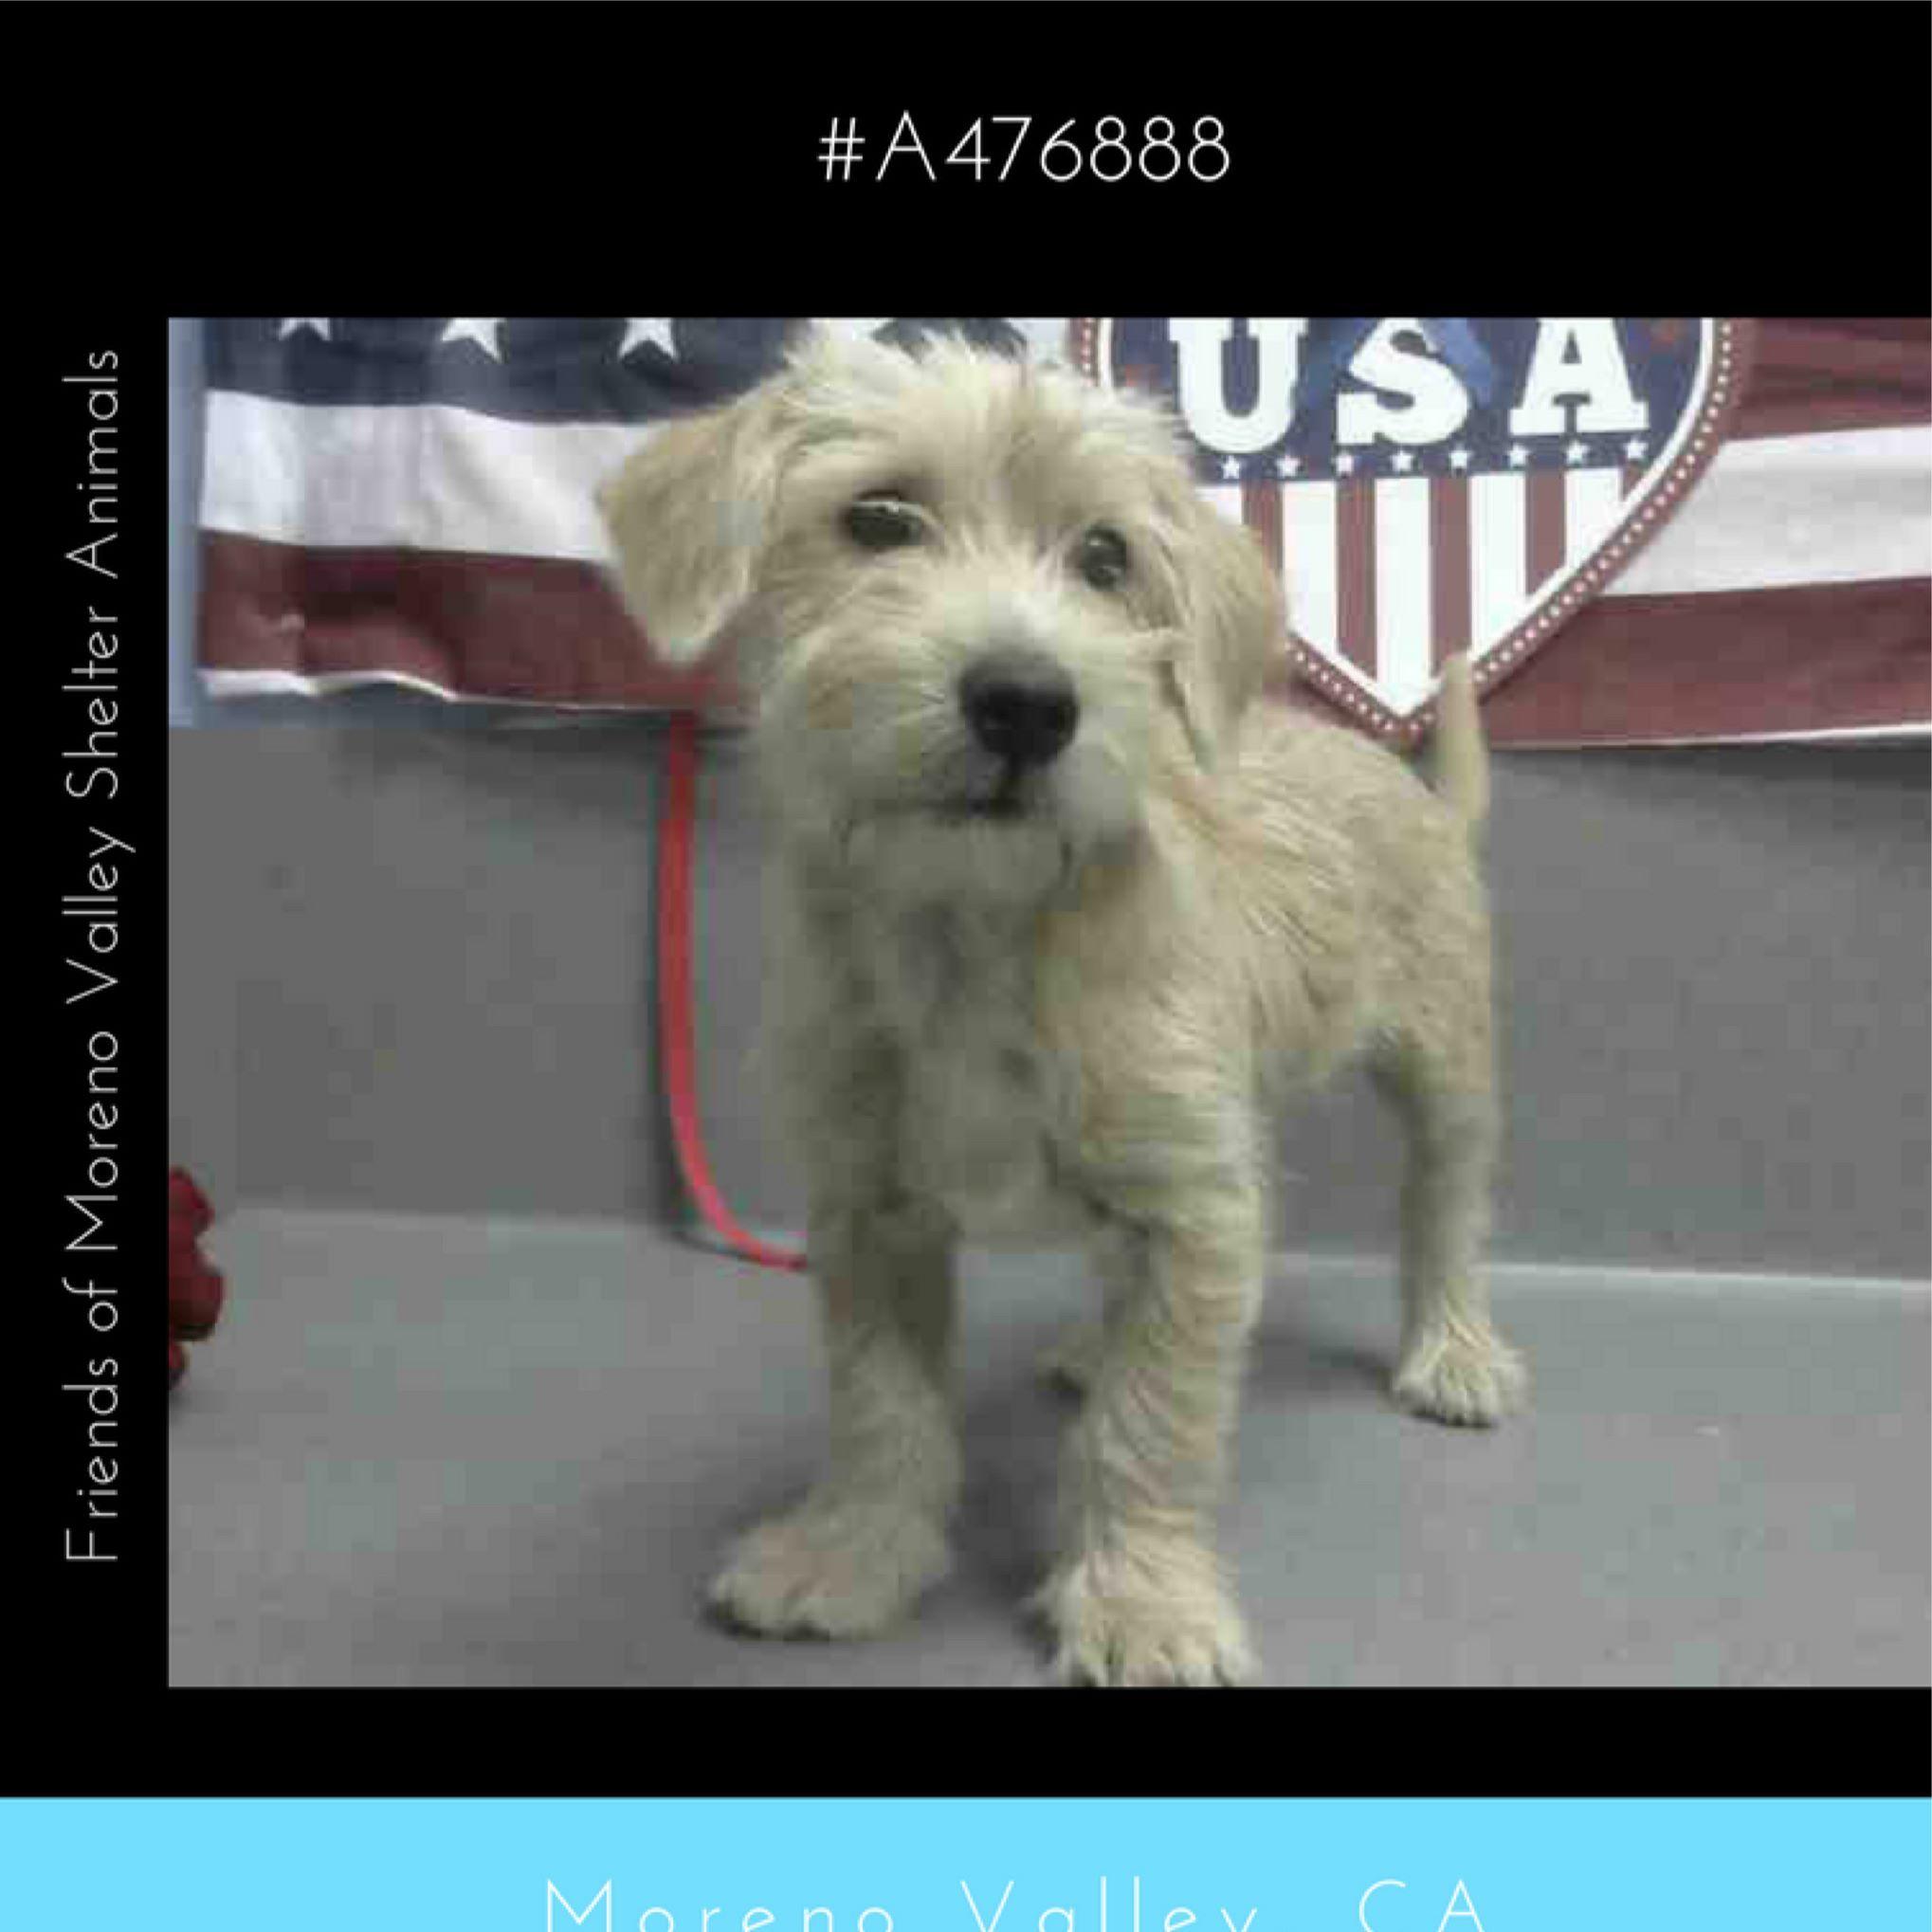 CURAN A476888 (Moreno Valley CA) Male tan Terrier mix